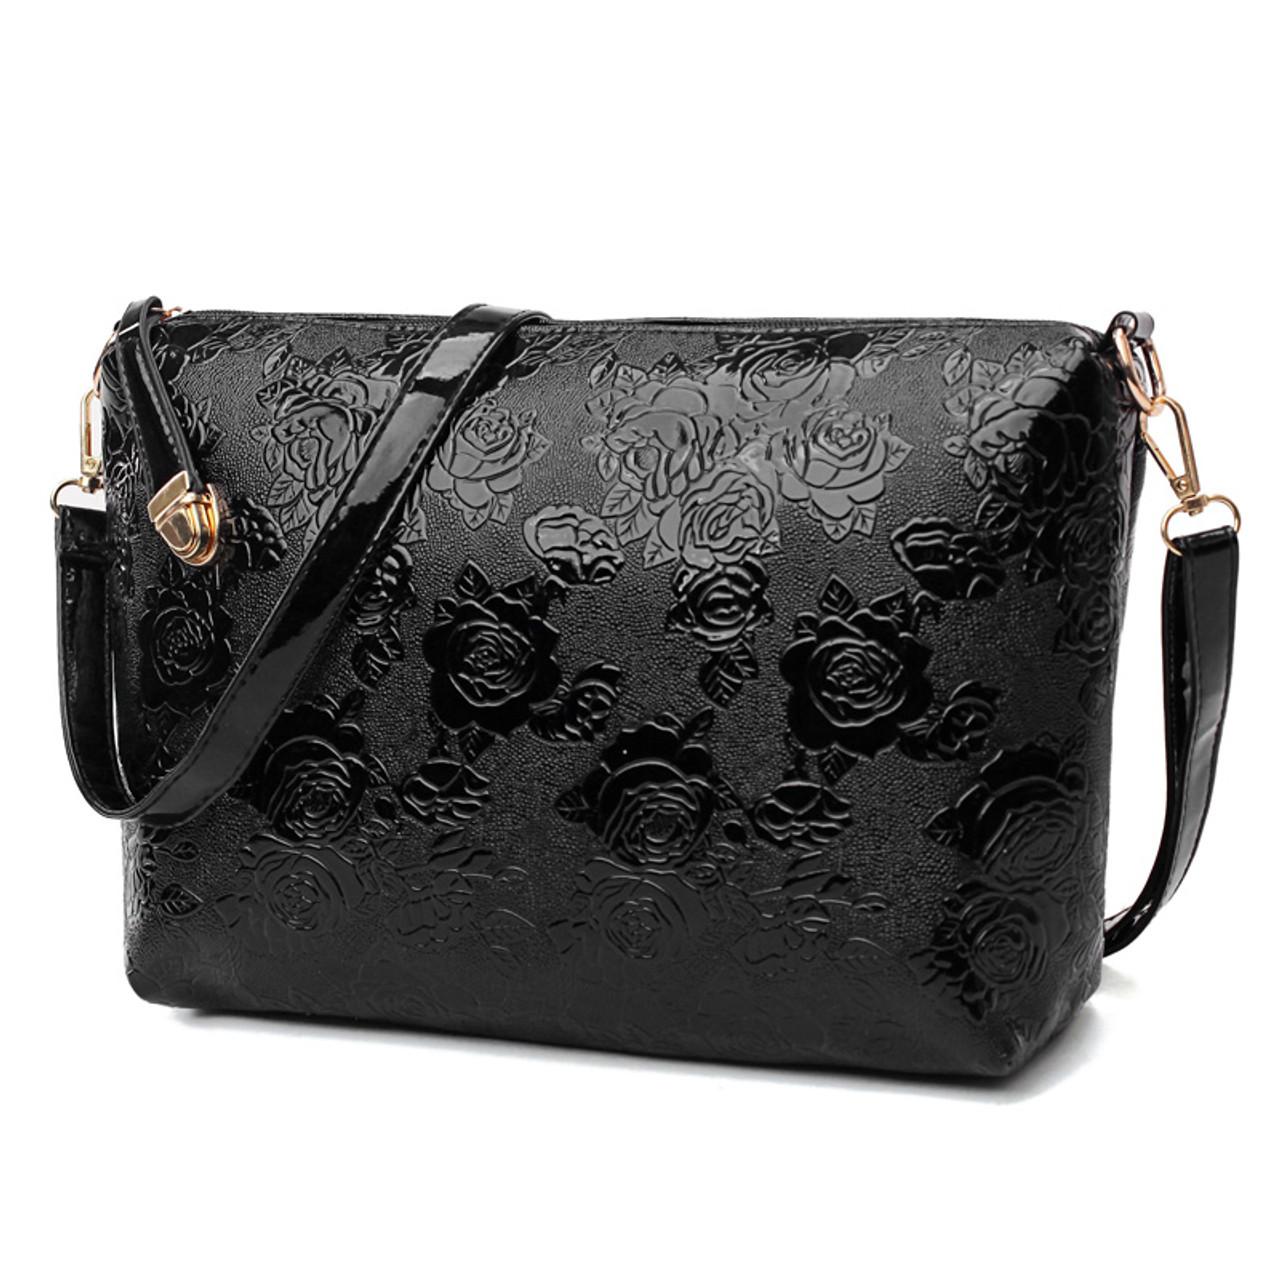 70cddee171886 ... Women's Handbags Fashion Shoulder Bag Female Messenger Bag High Quality  6-Piece Set Famous Designer ...